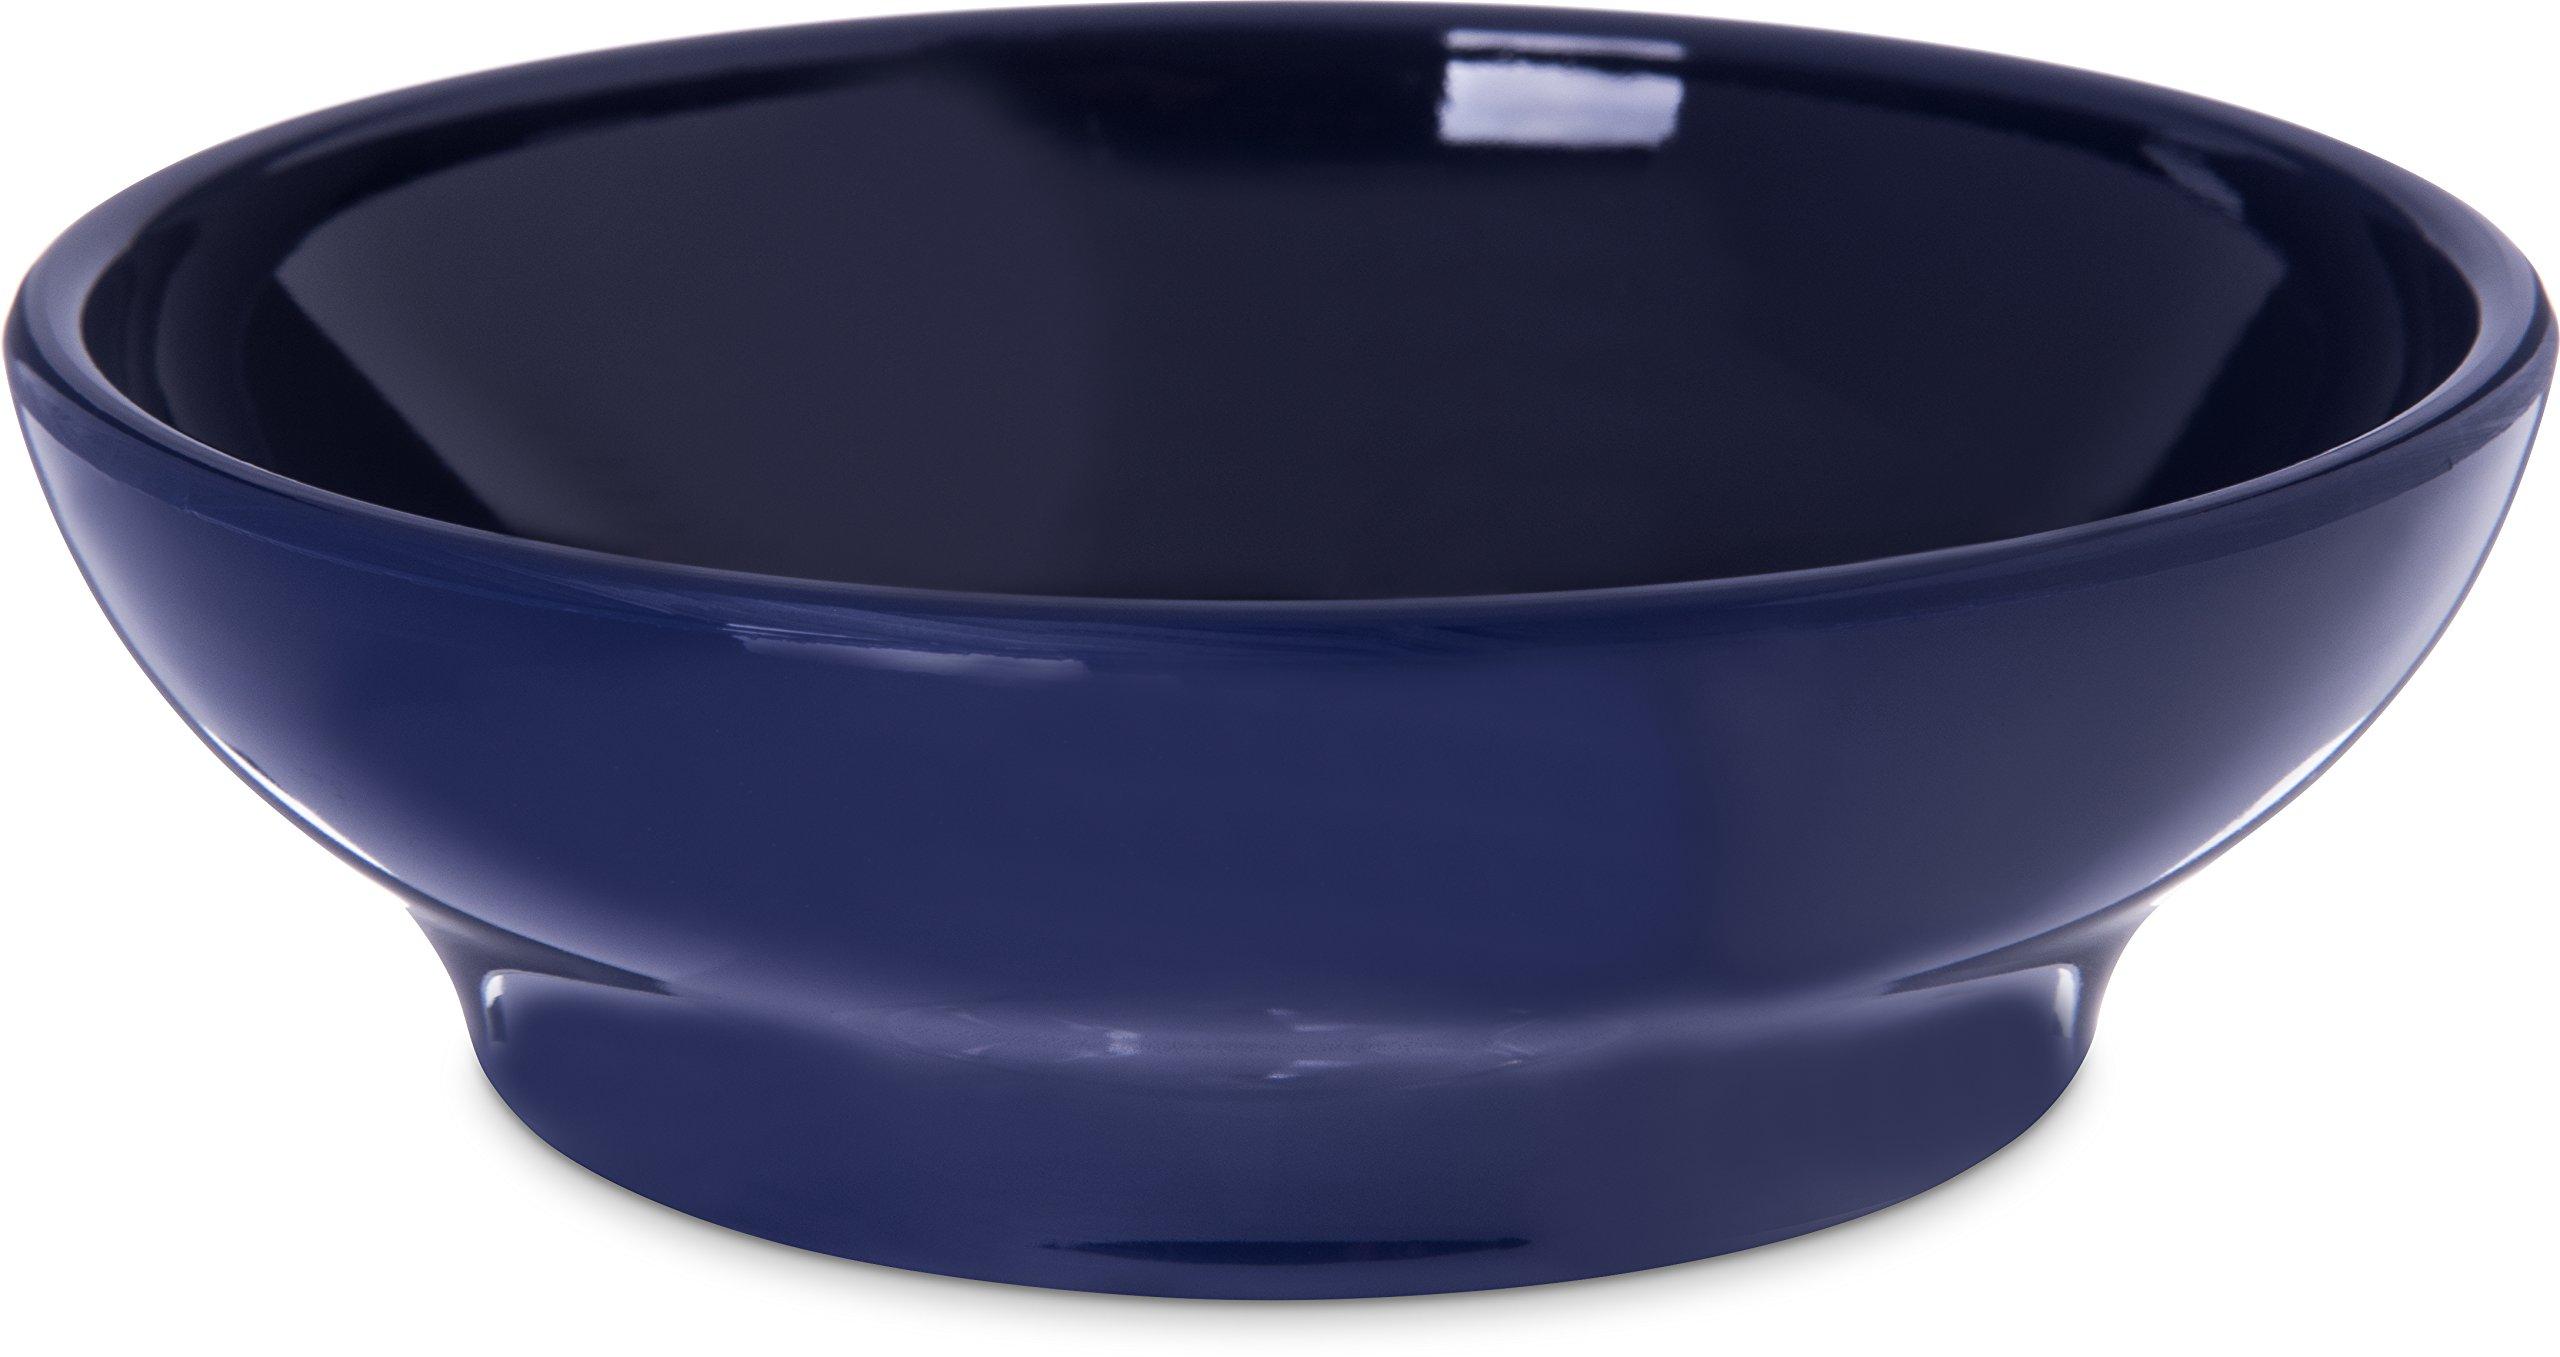 Carlisle 4312560 SAN Salsa Dish Ramekin, 5 oz Capacity, 1.80'' Height, Cobalt Blue (Case of 48)